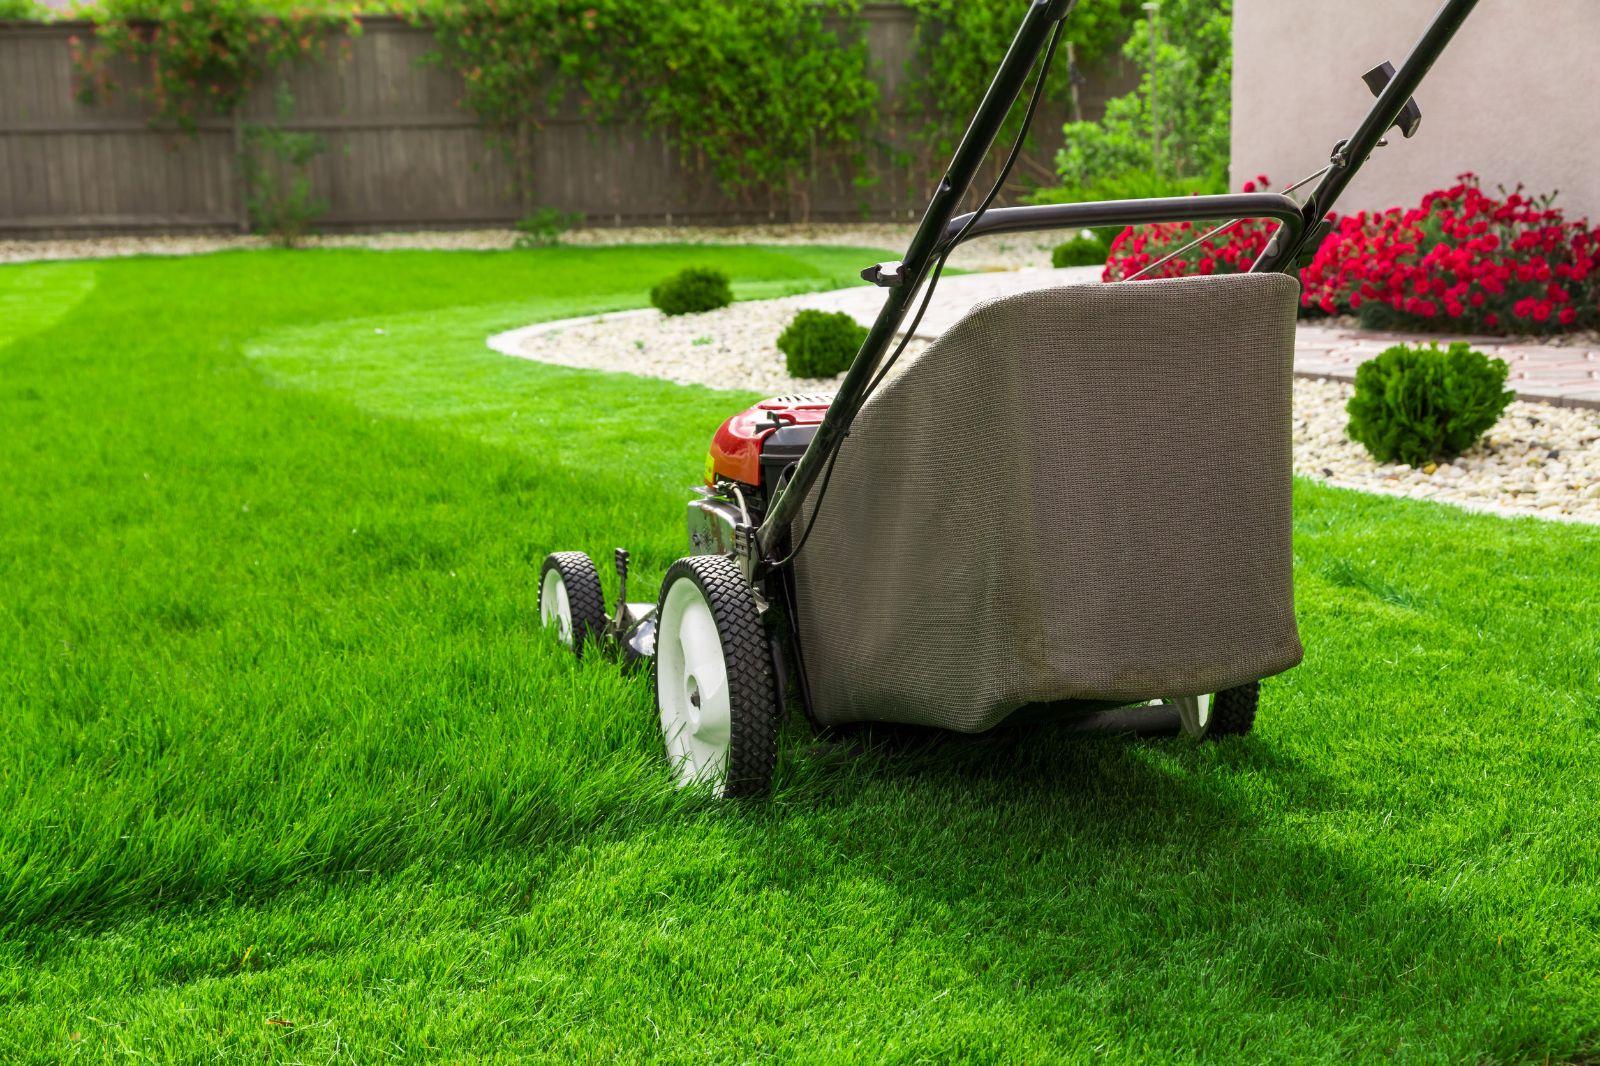 Košnja trave, zalivanje, gnojenje in prezračevanje